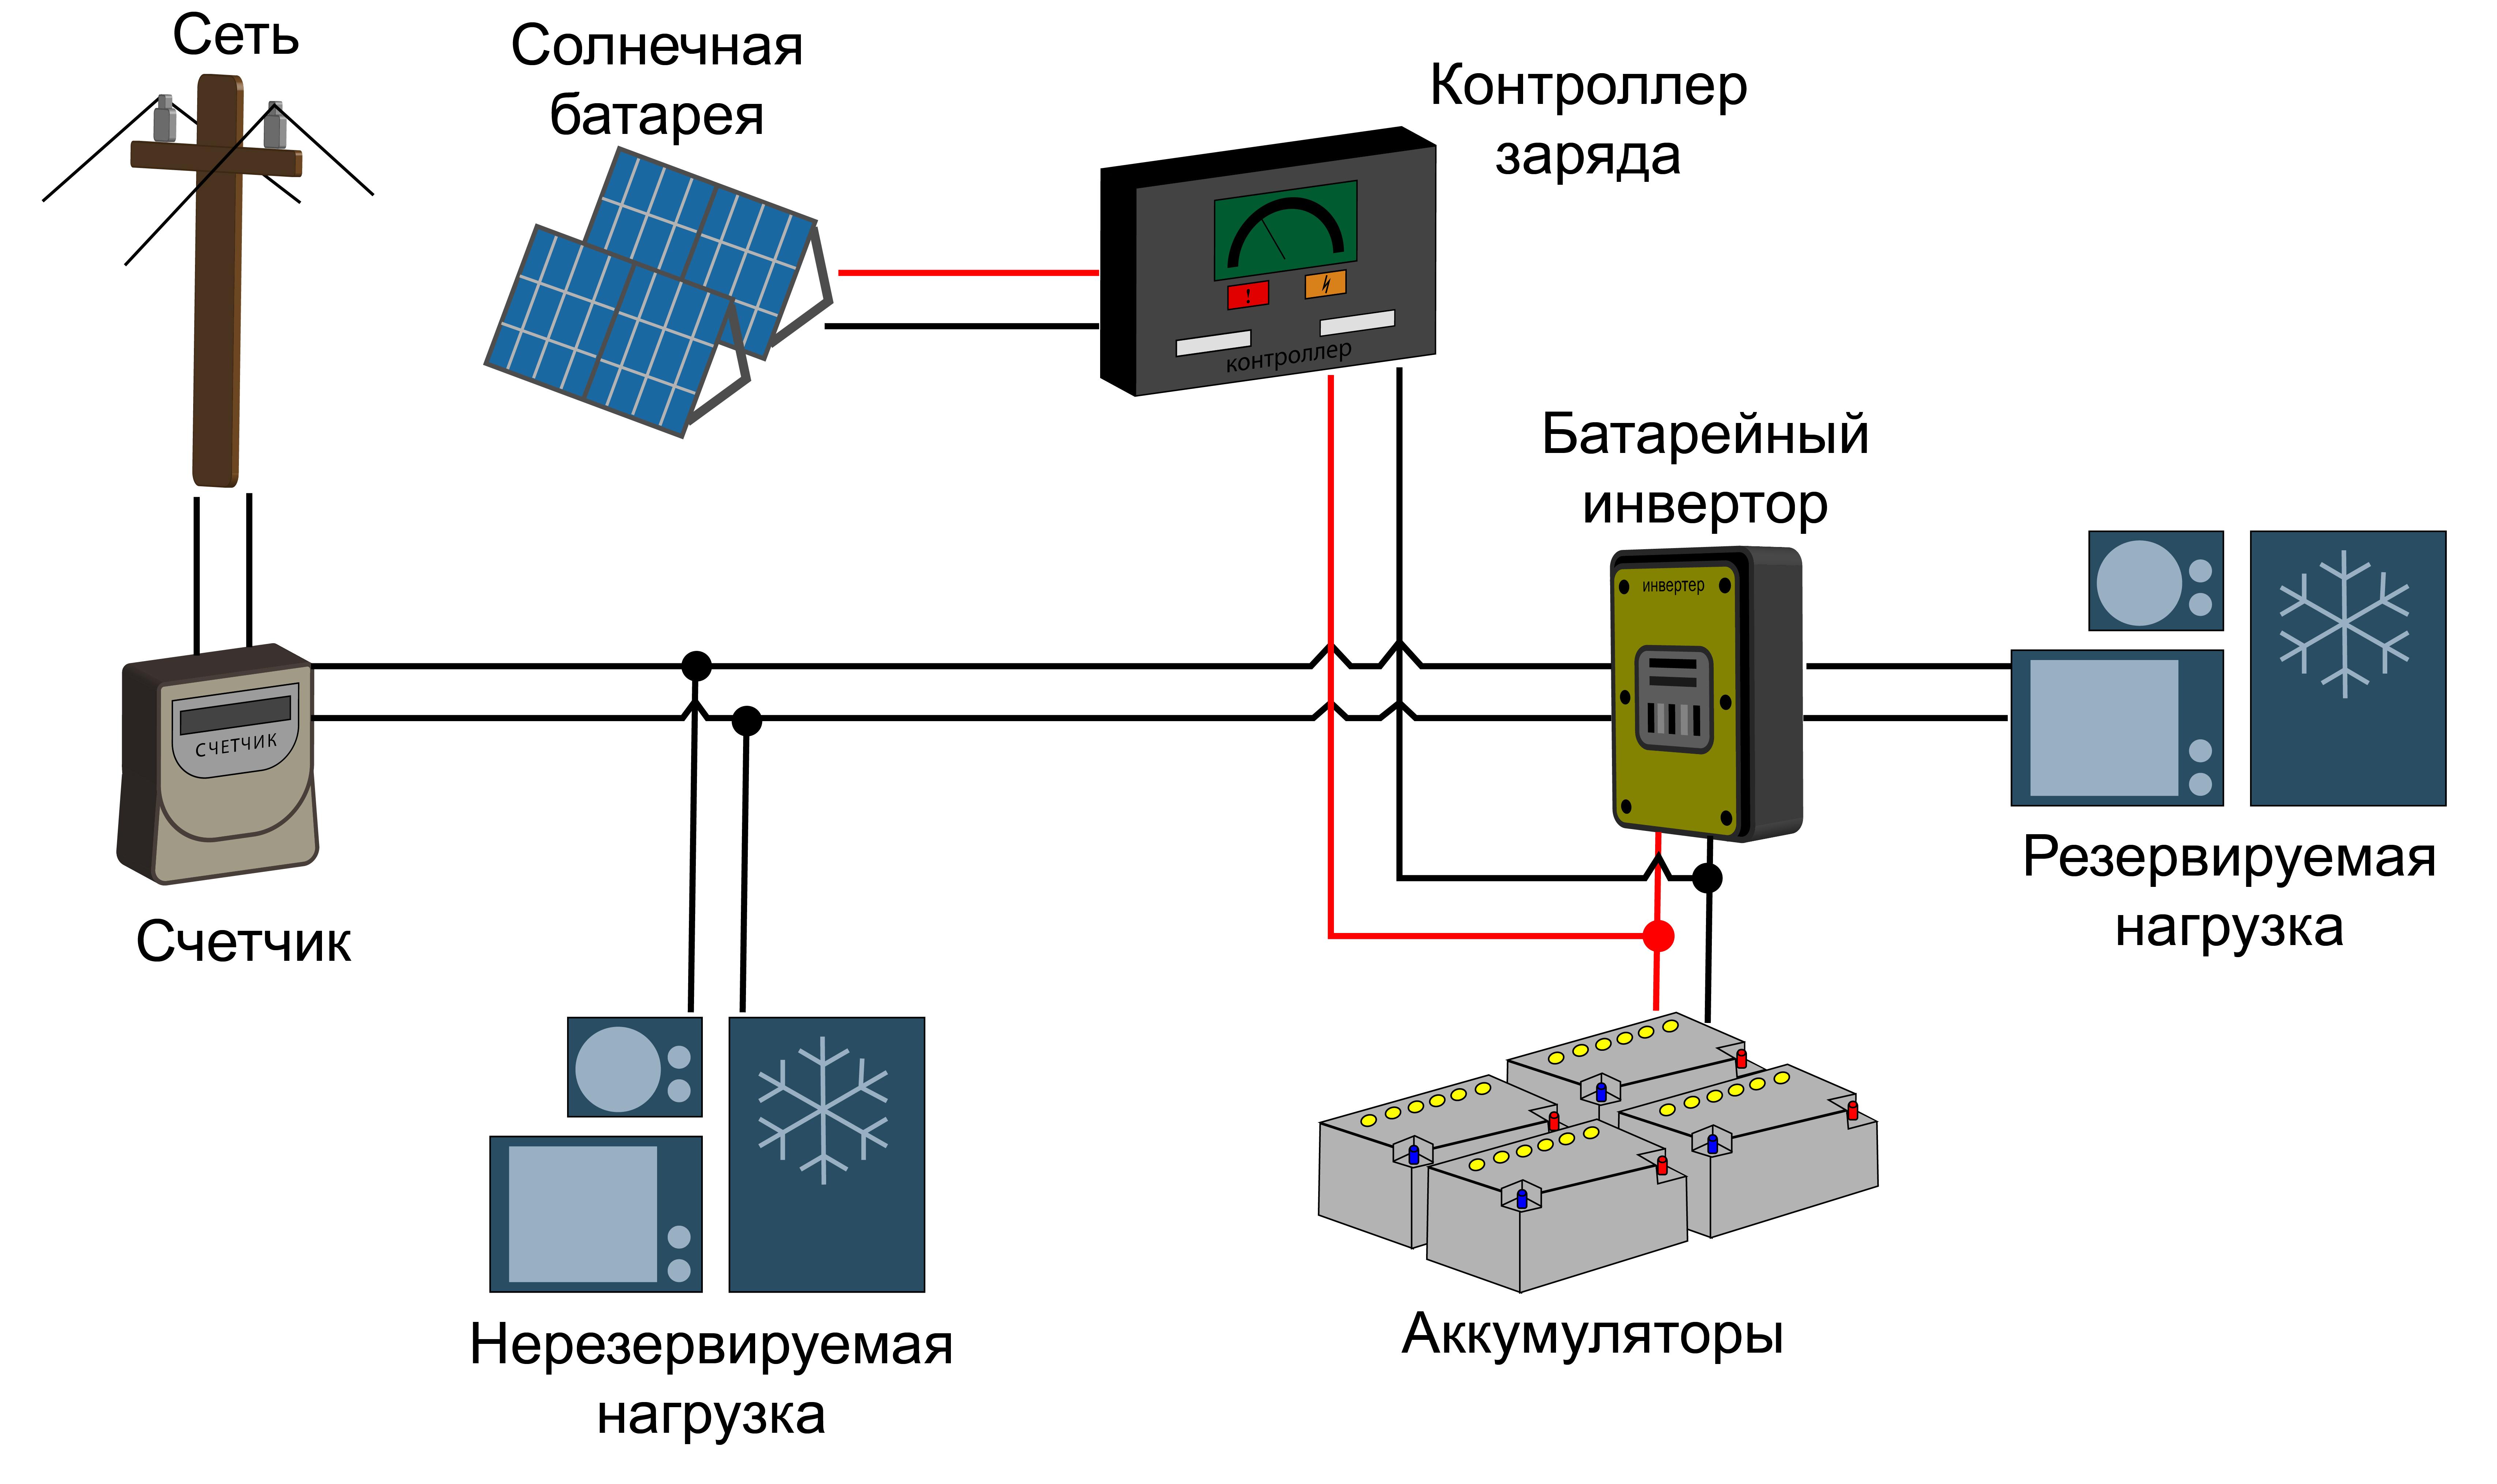 схема контролера заряда аккумултора